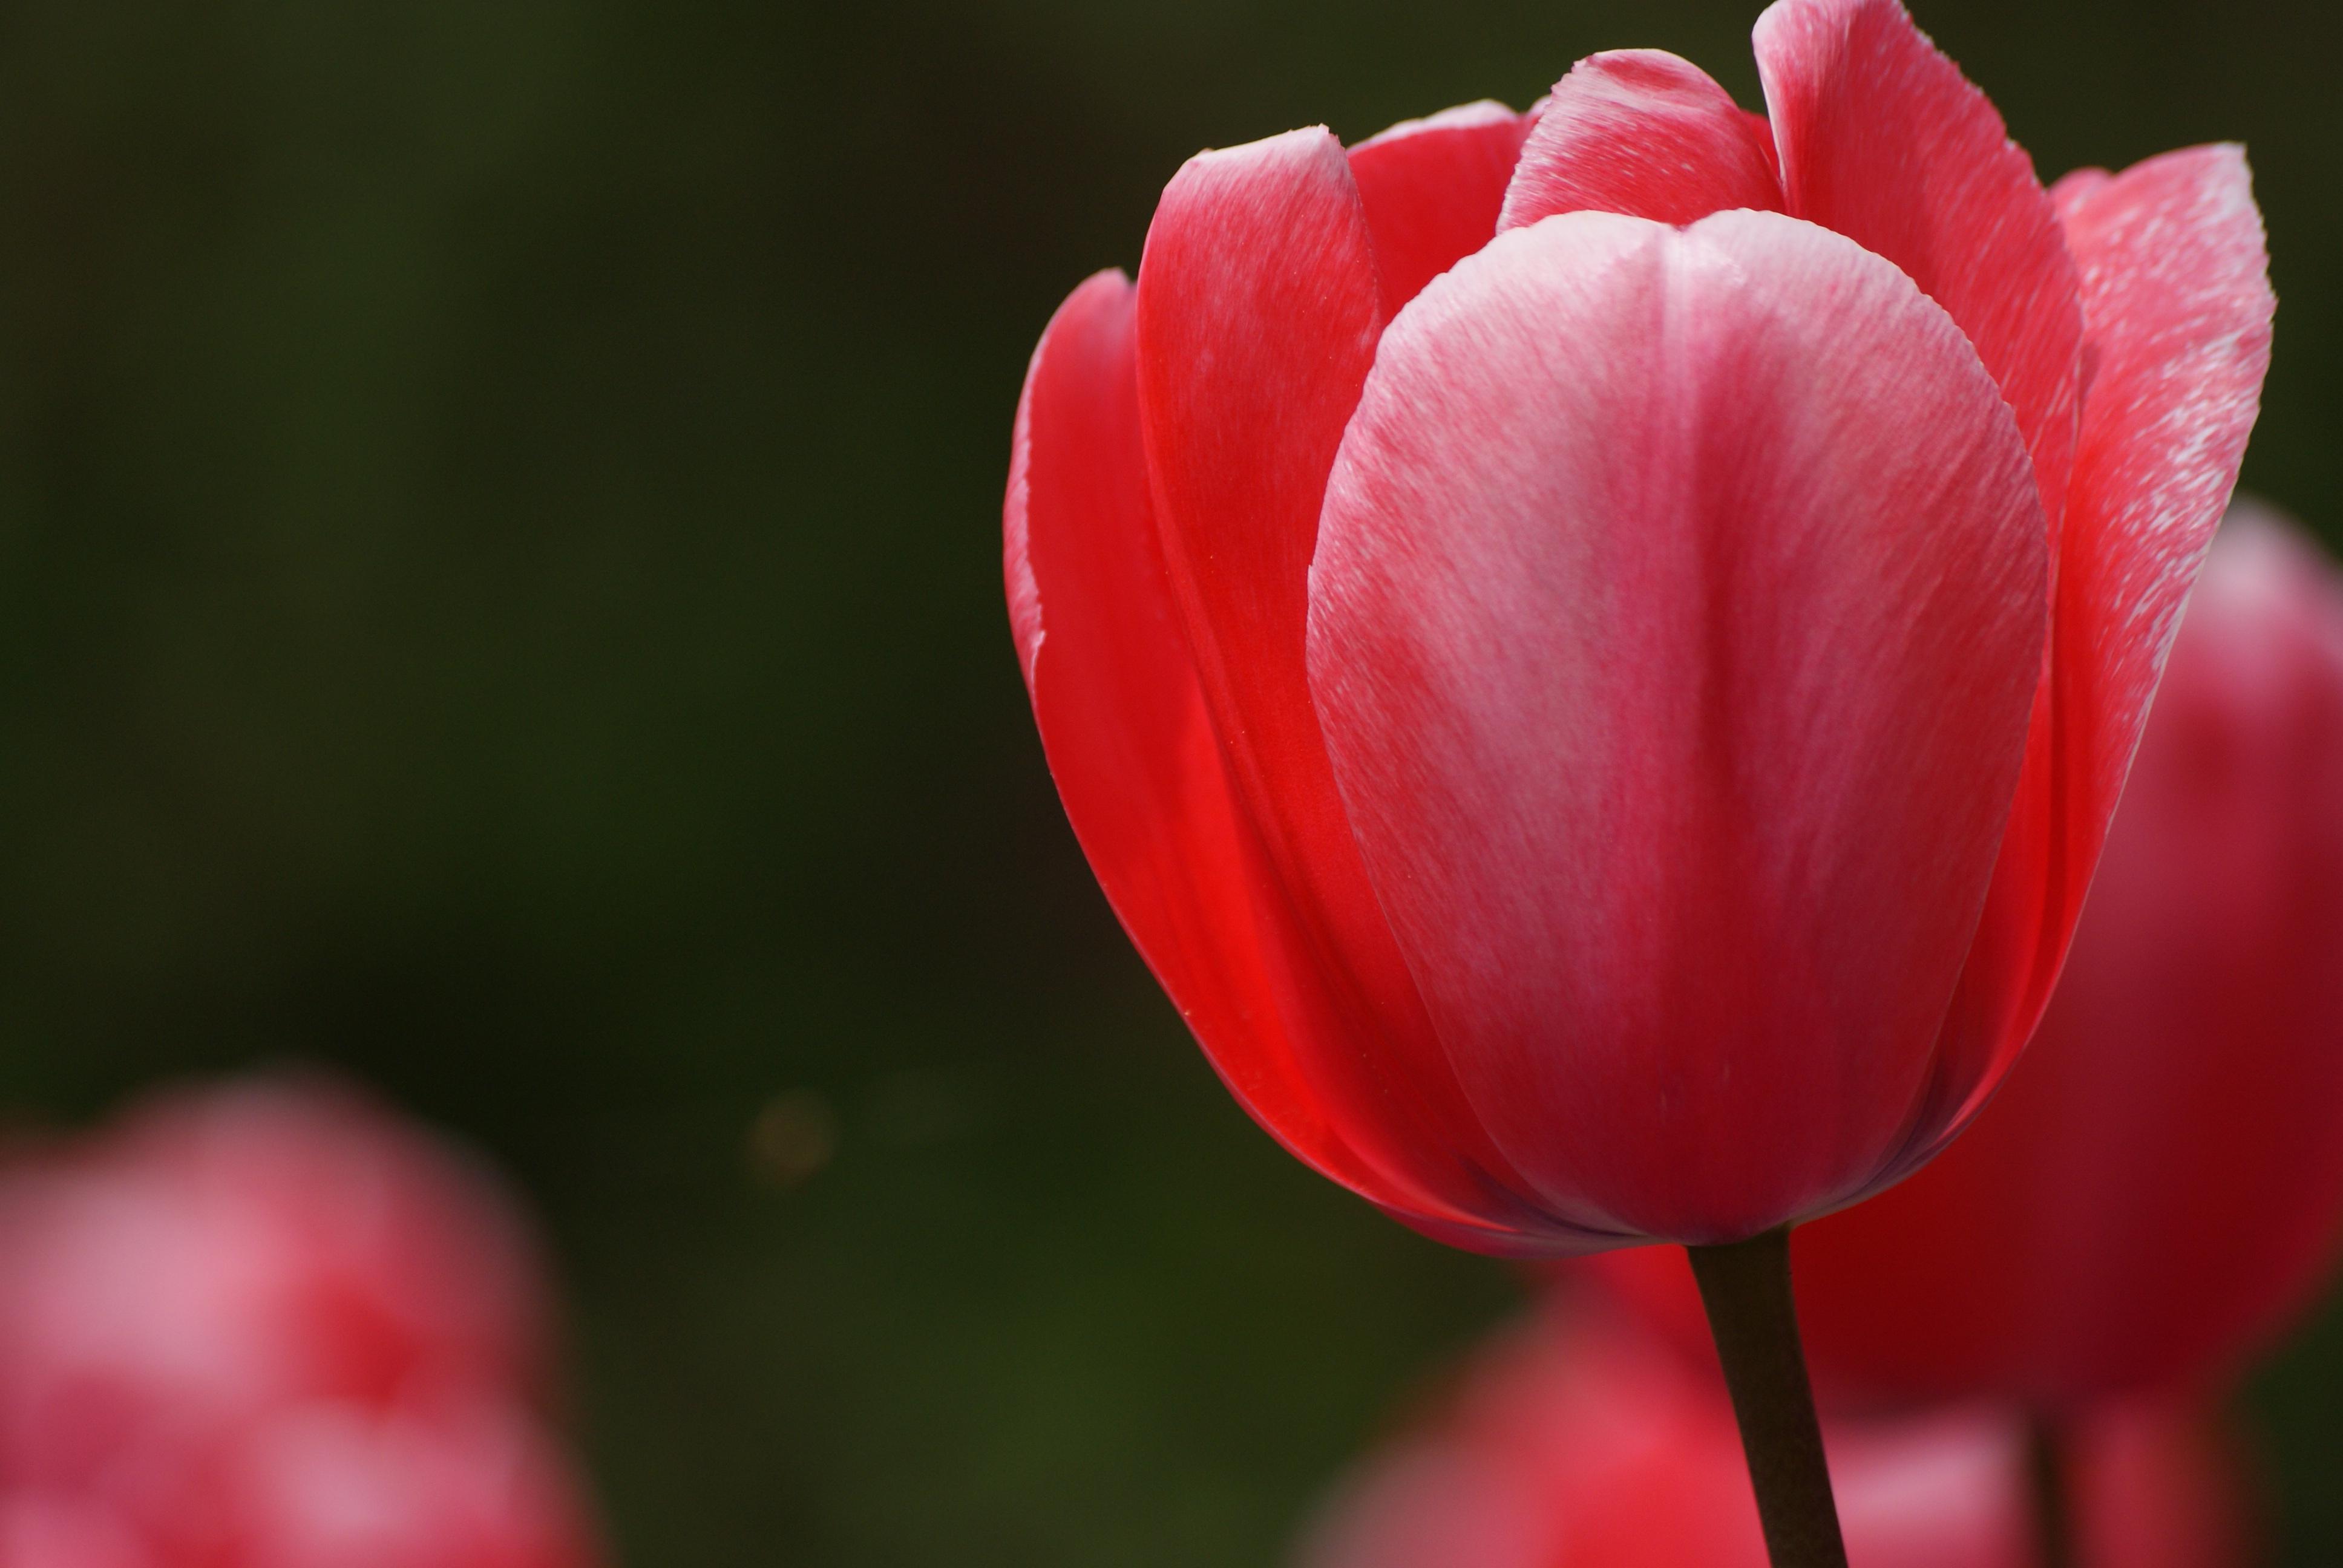 Free Images Flower Petal Tulip Spring Red Flowers